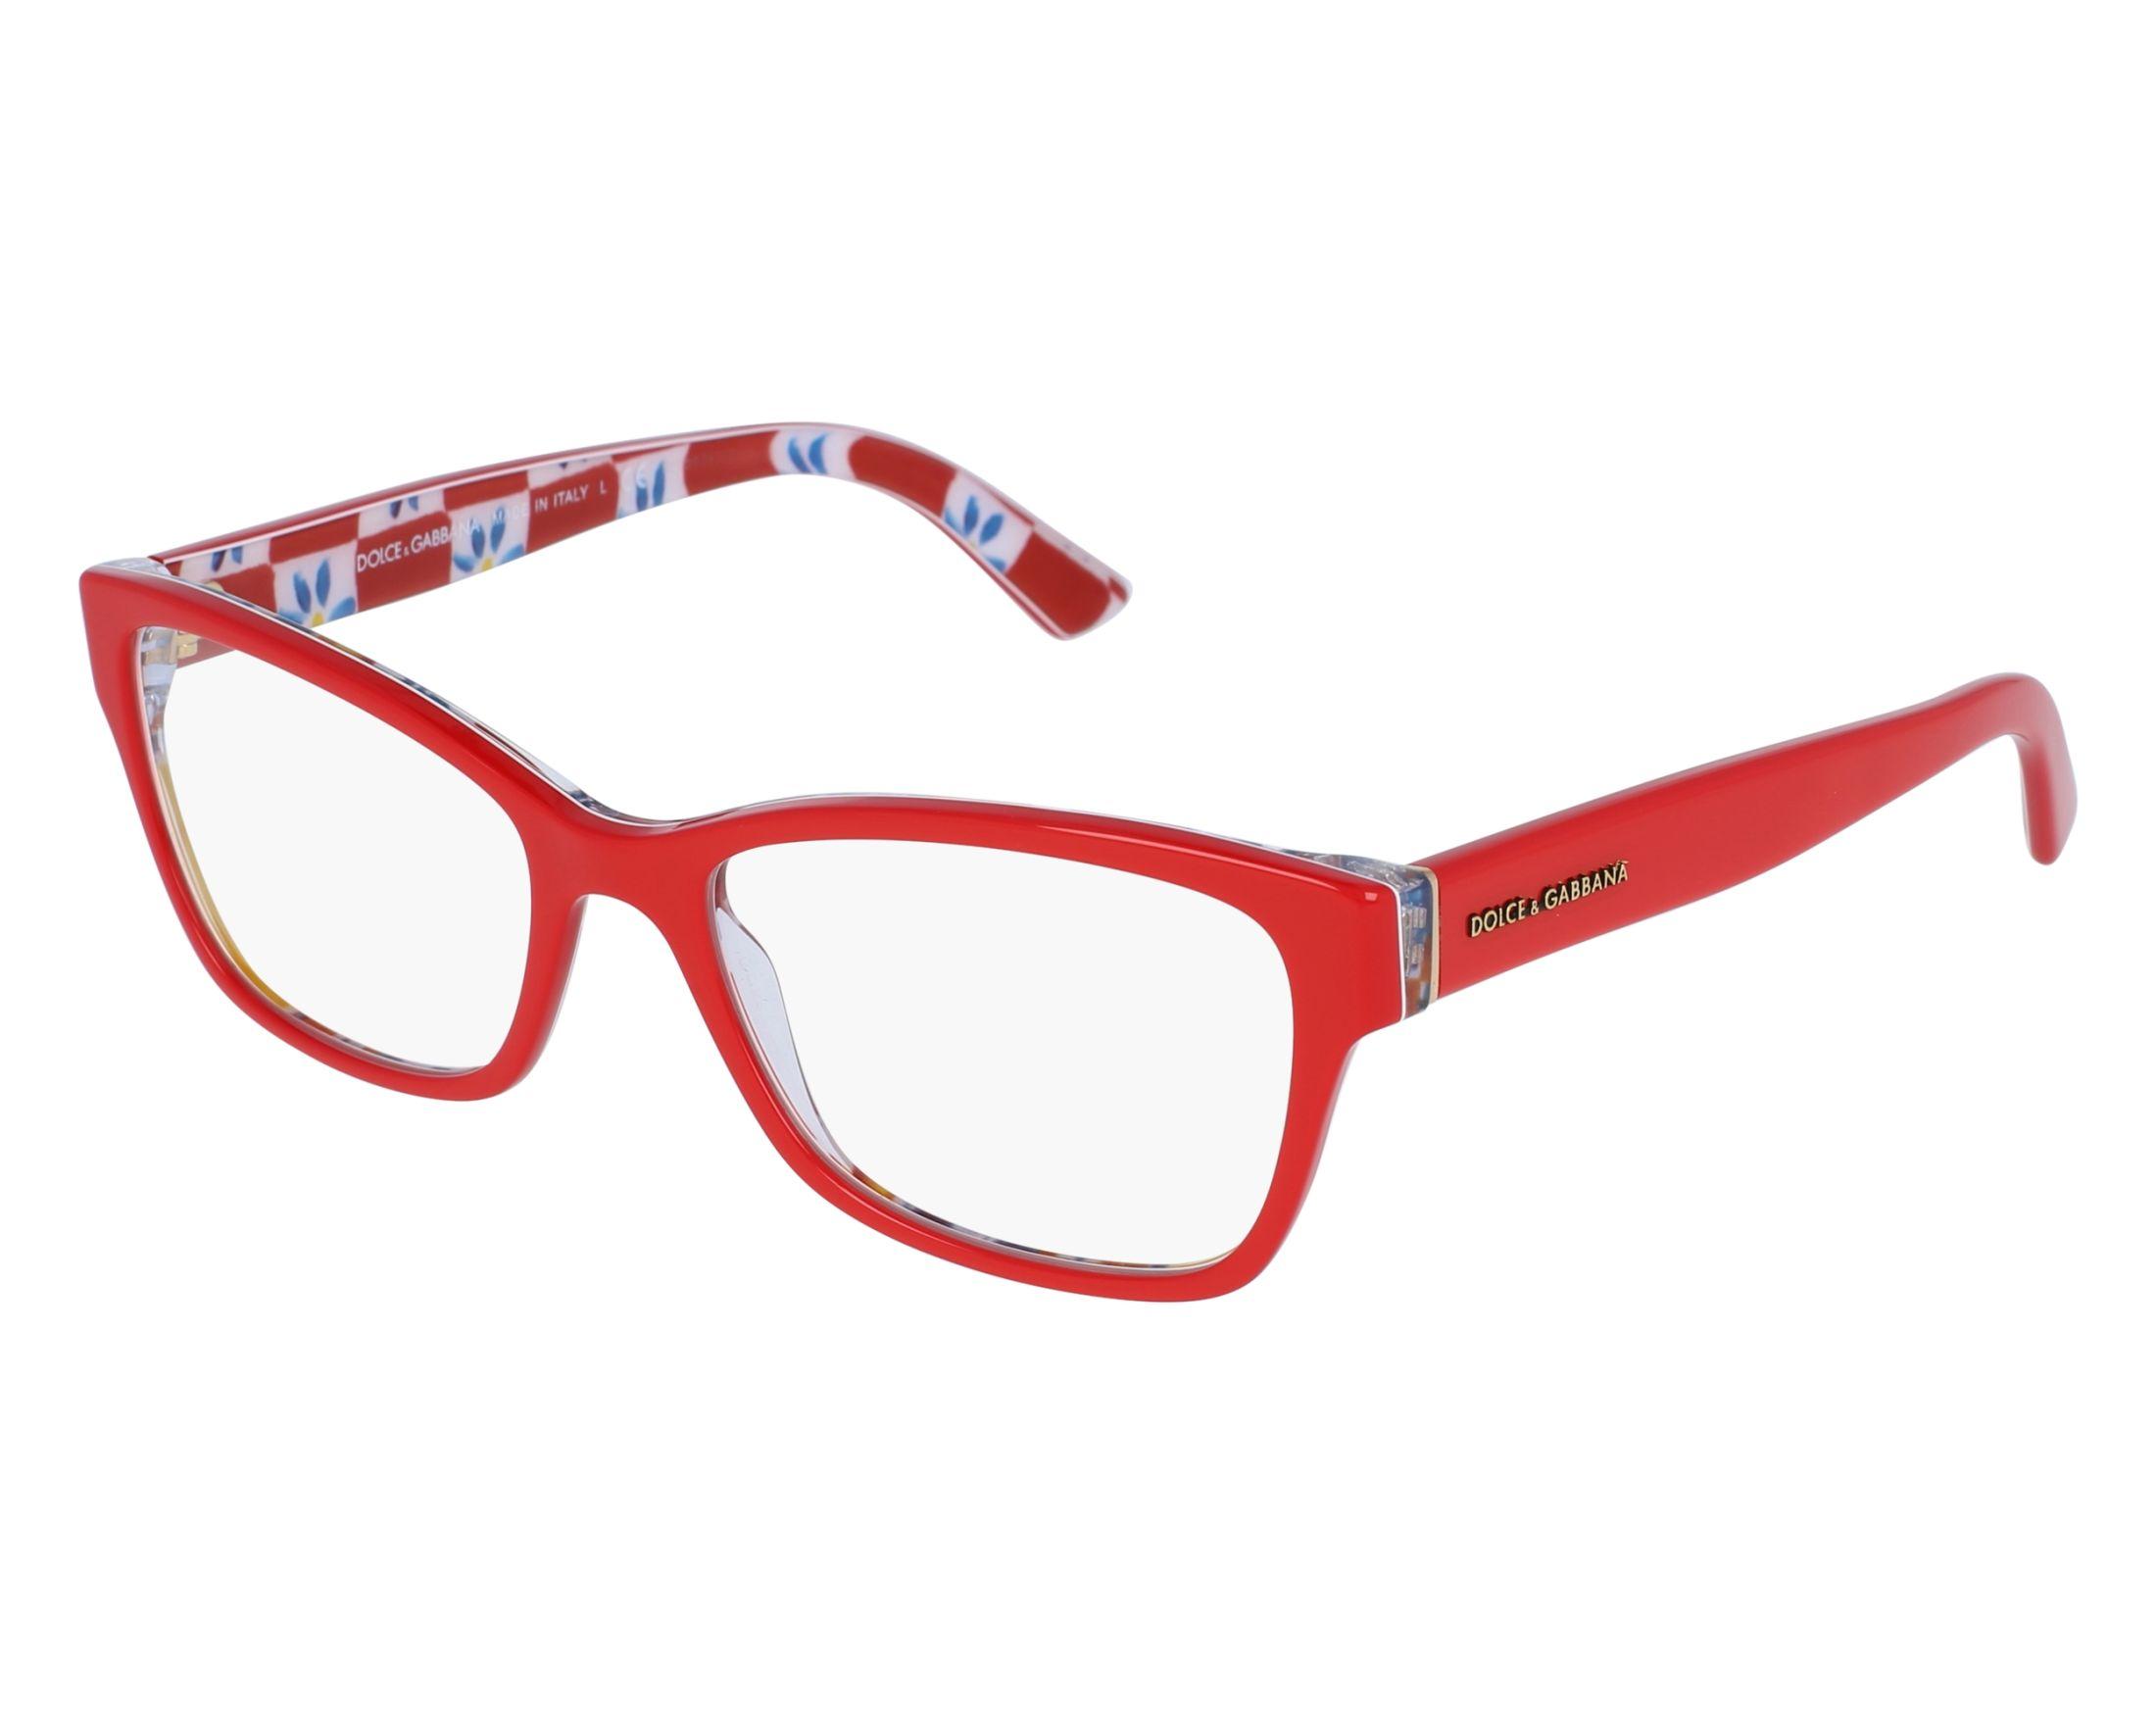 Dolce & Gabbana Sunglasses Brick red with Lenses DG-3274 3129 ...